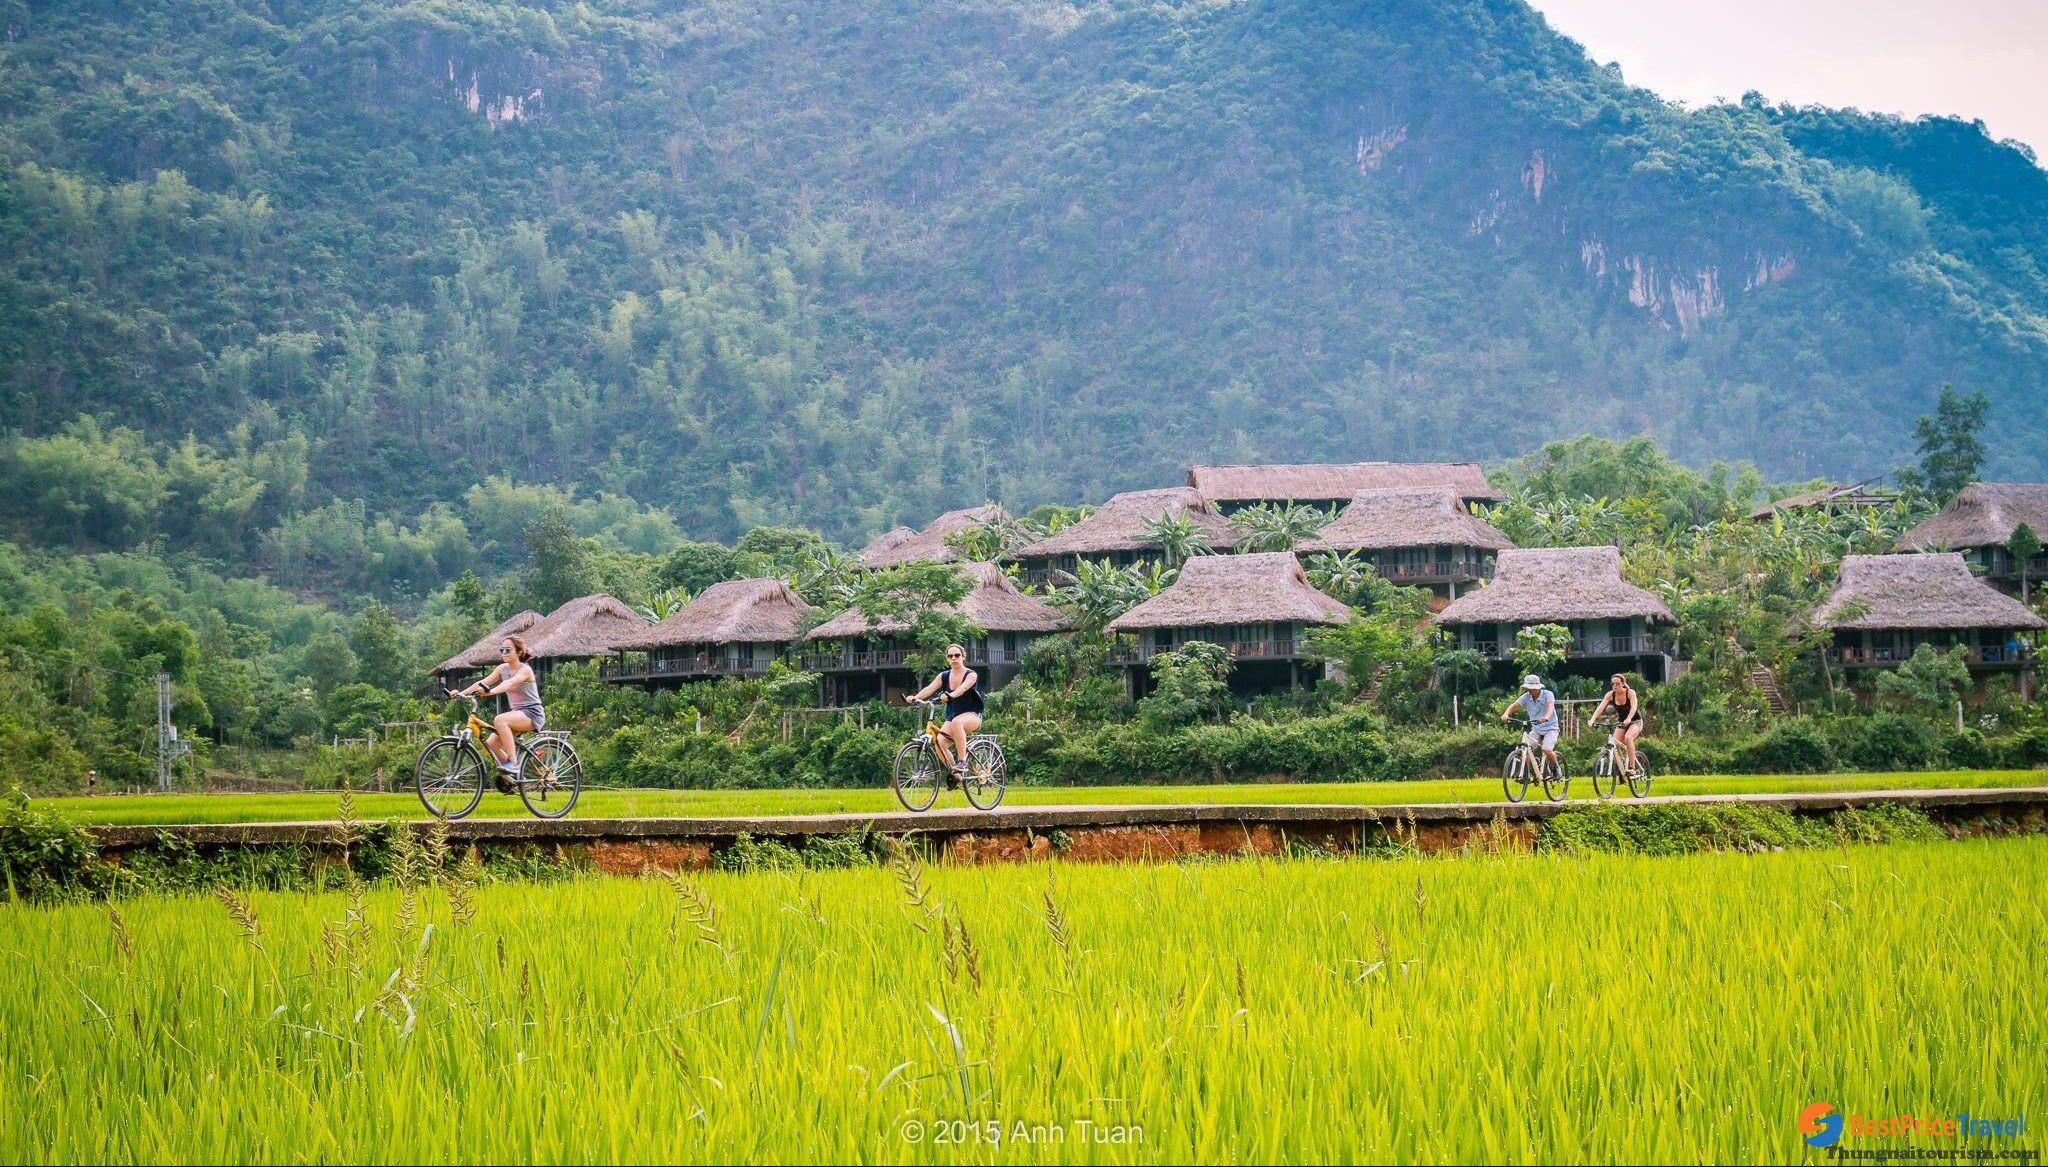 Lac Village - Mai Chau Valley